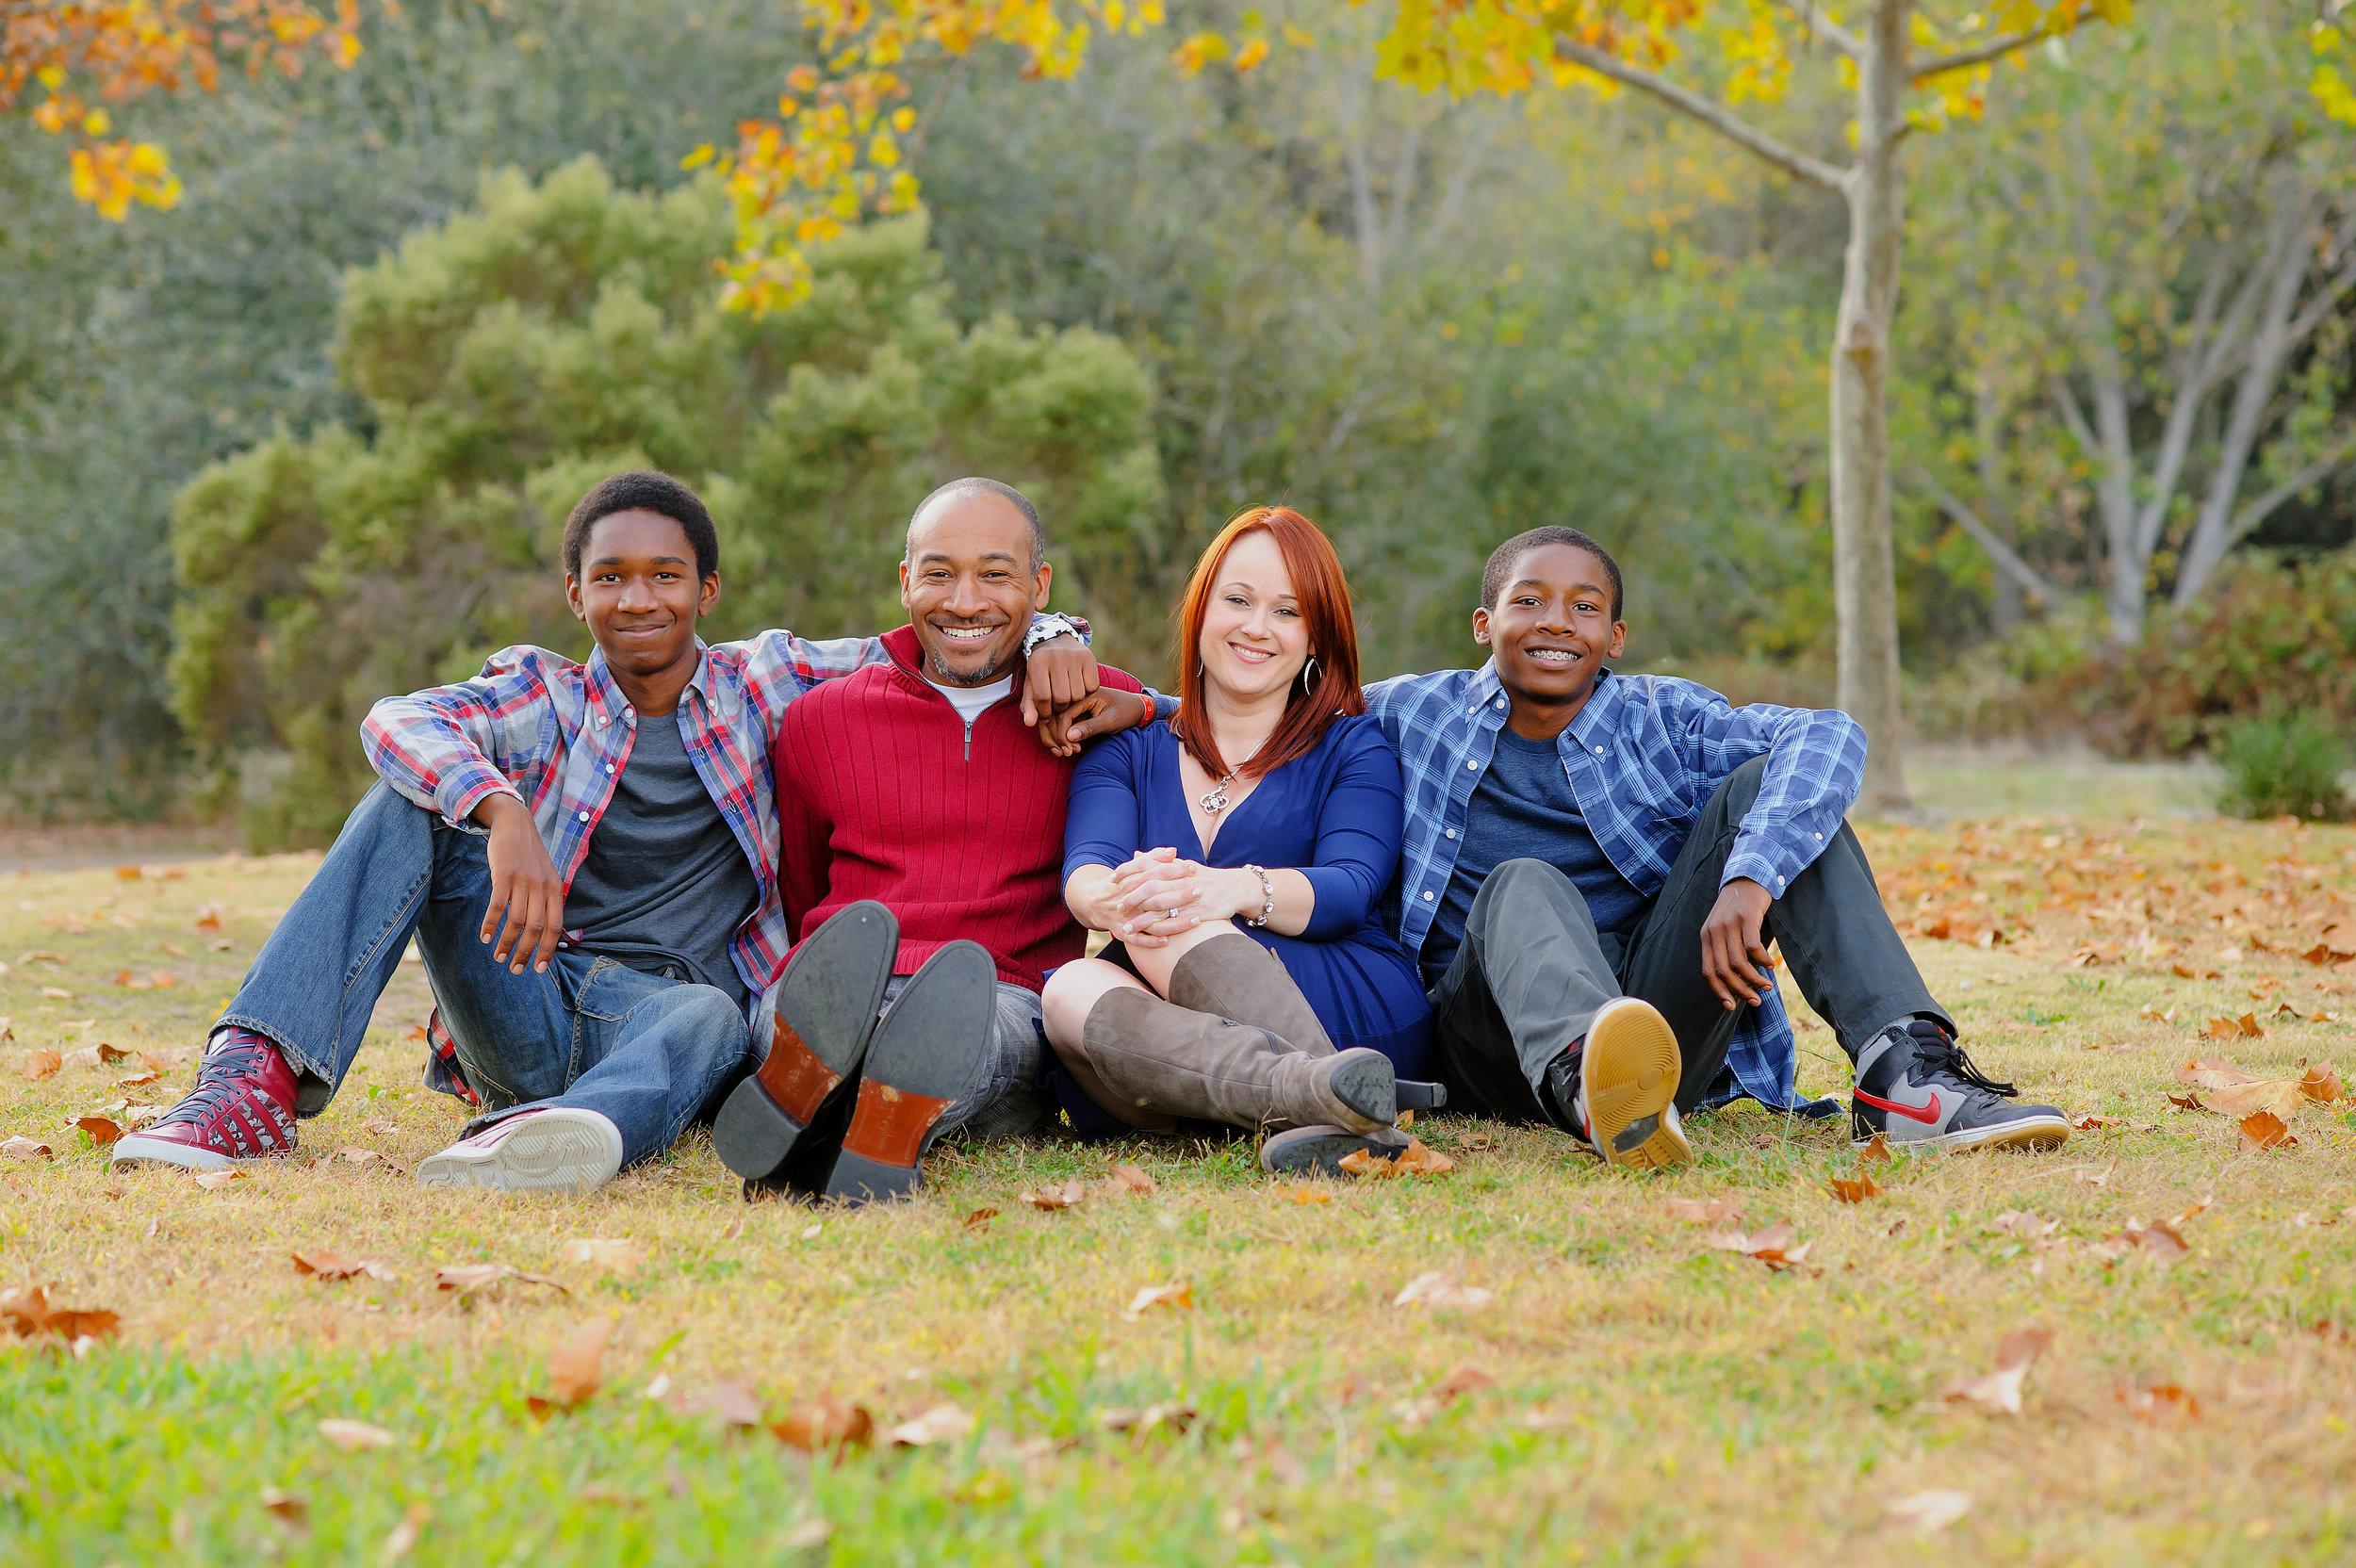 mira-khaim-095-sacramento-family-photographer-katherine-nicole-photography.JPG